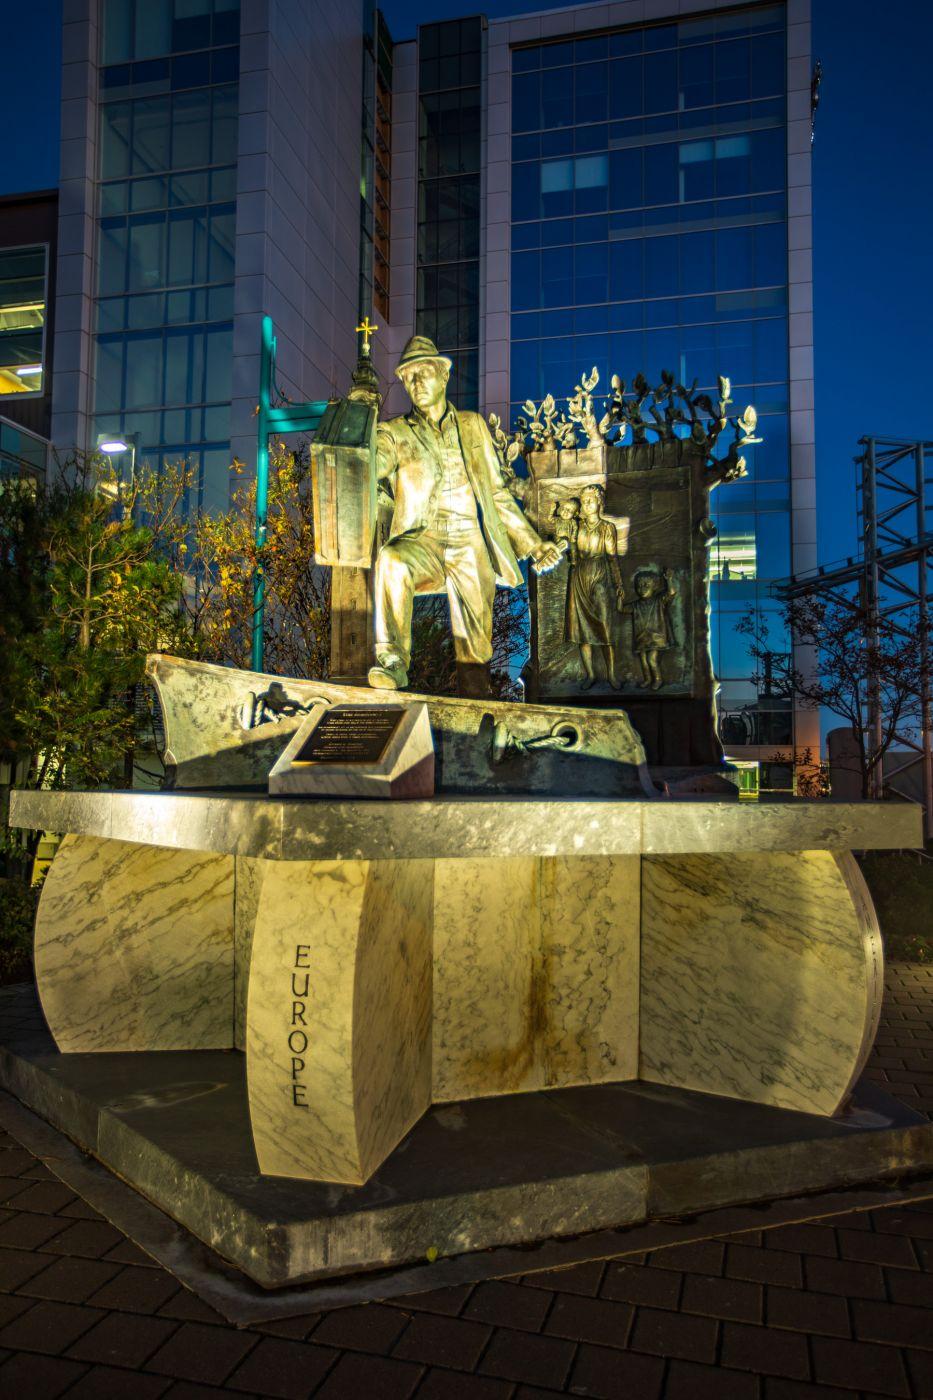 The Emigrant Statue Halifax, Nova Scotia, Canada